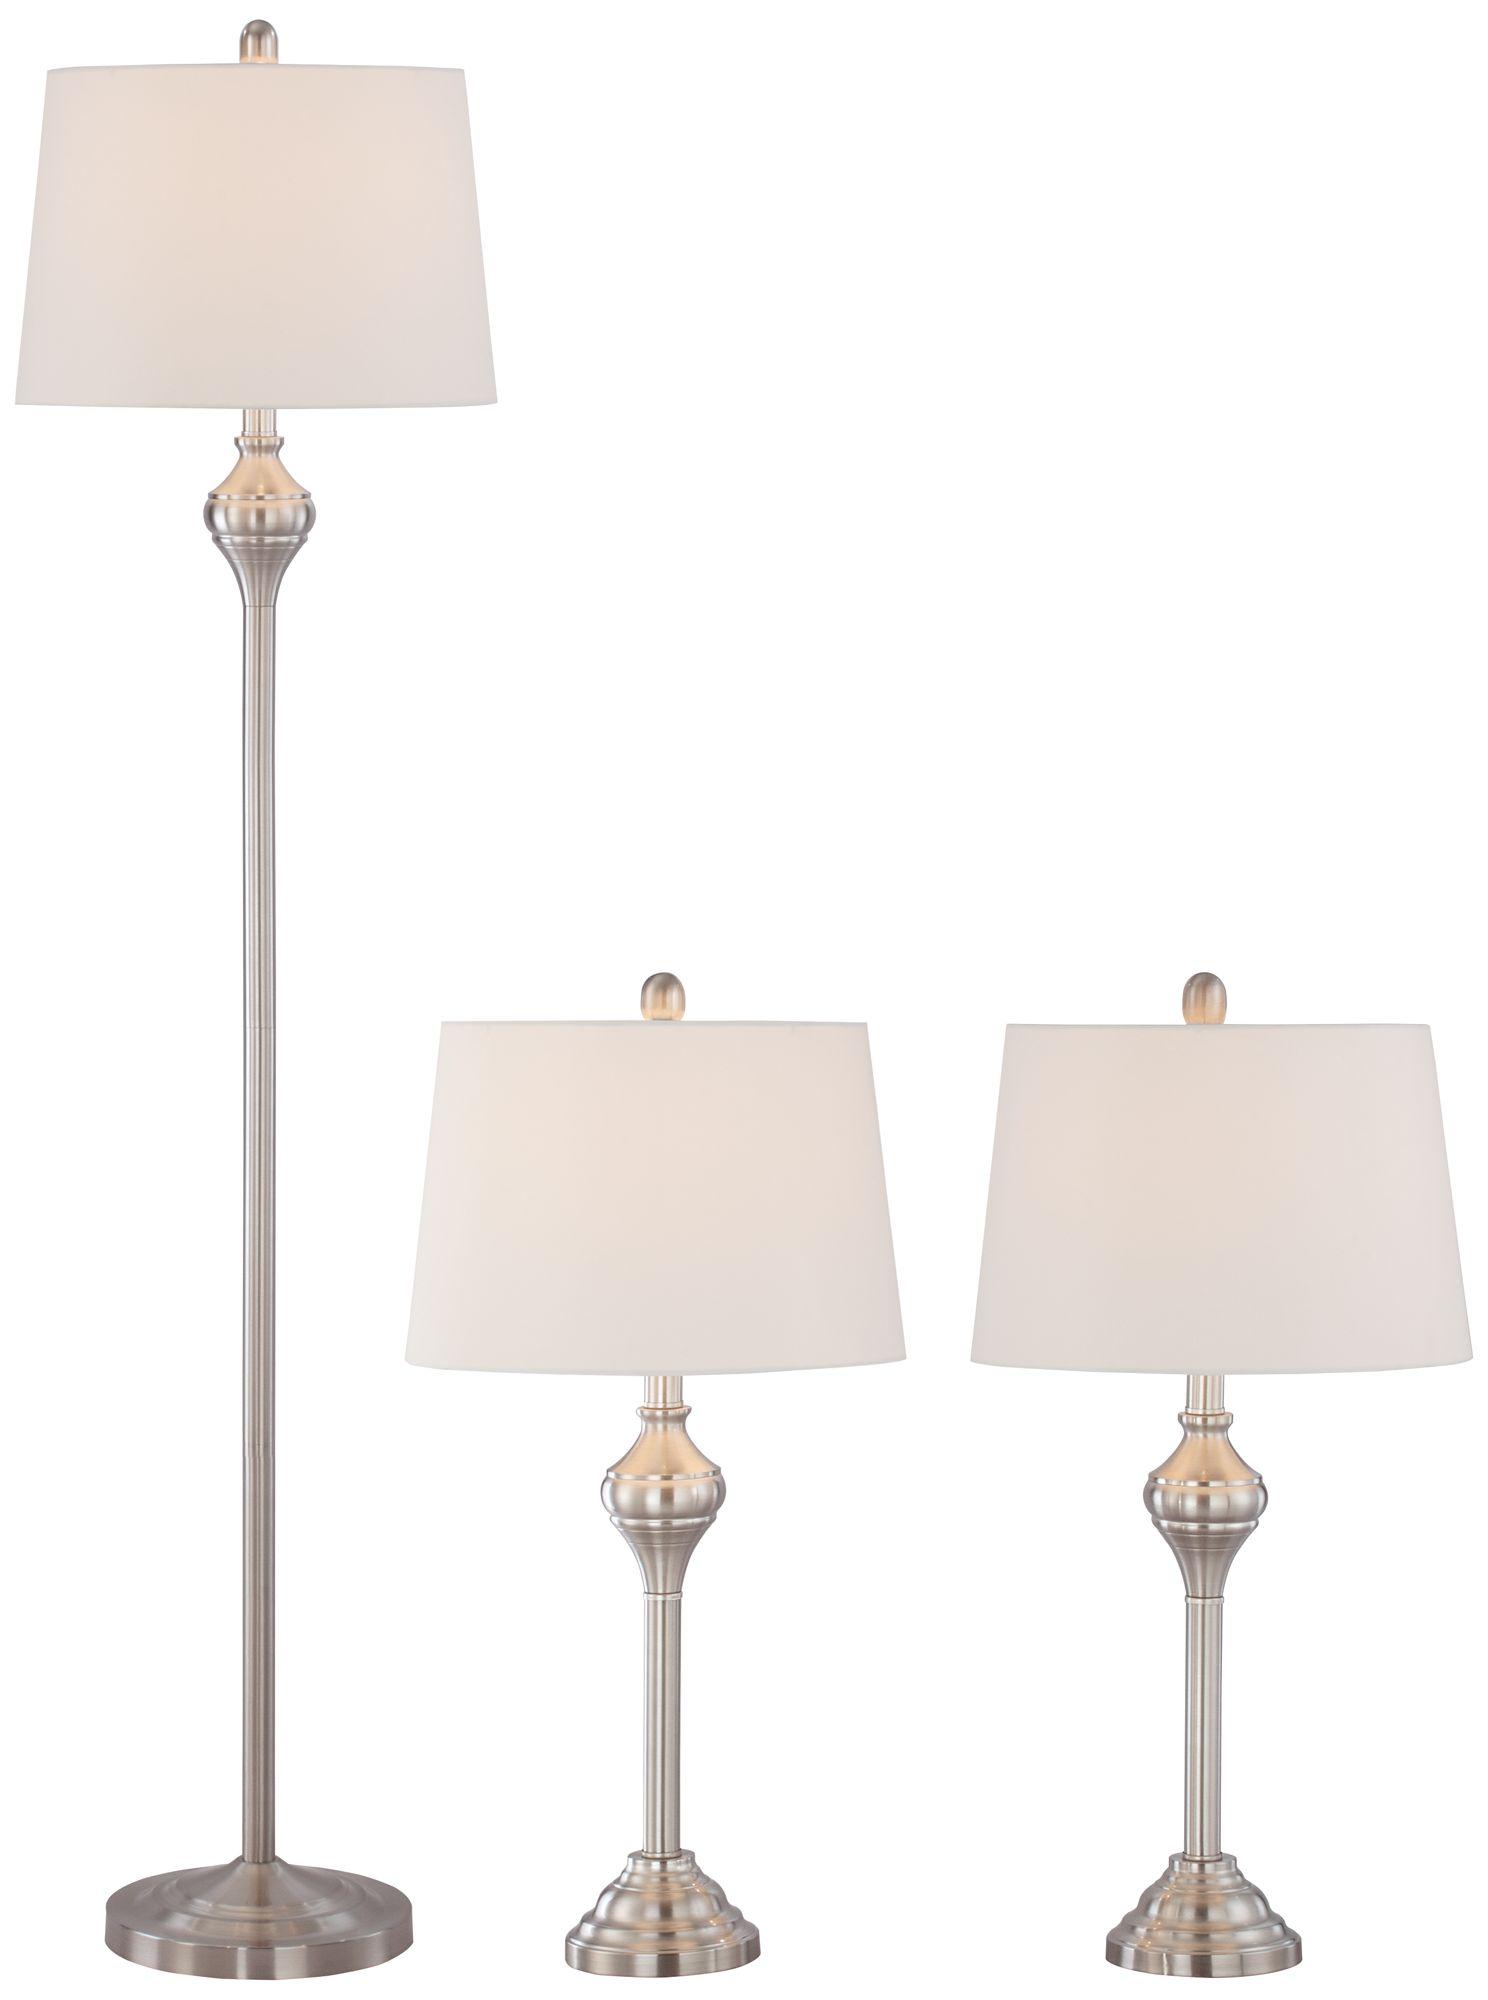 Mason Brushed Steel 3-Piece Floor and Table L& Set  sc 1 st  L&s Plus & Floor Lamp Sets - Matching Table \u0026 Floor Designs | Lamps Plus